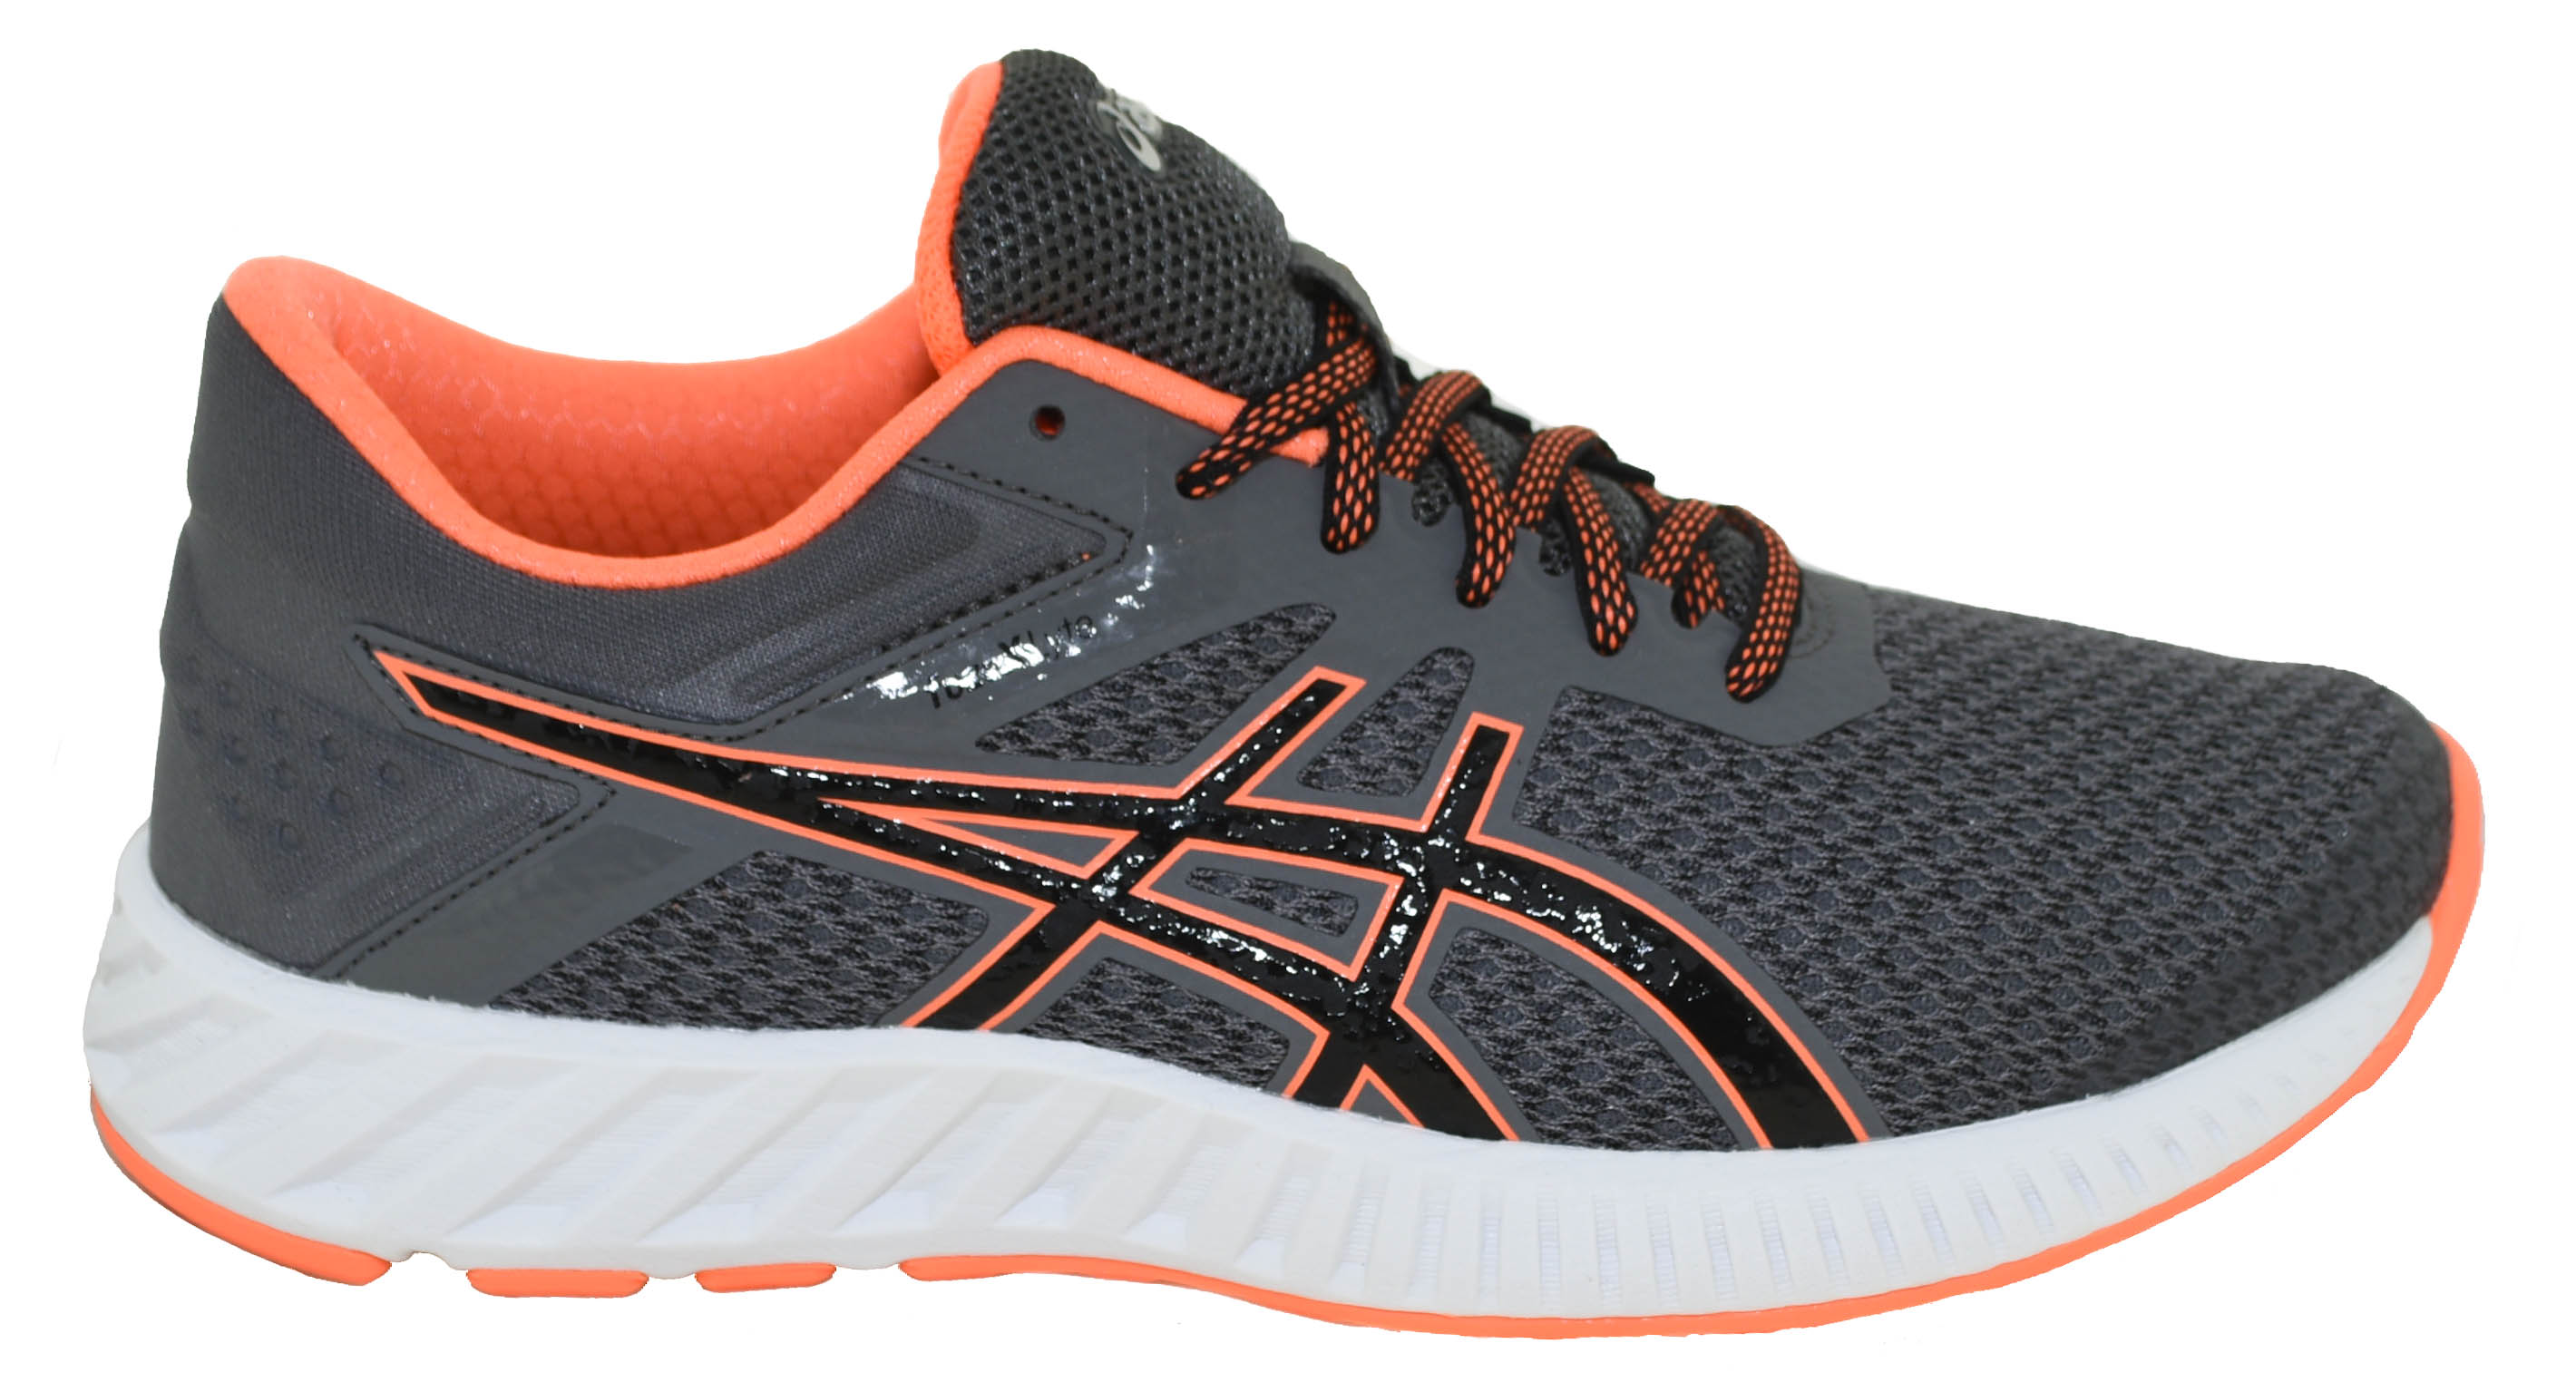 Asics Hommes FuzeX Lyte 2 Chaussures | de Course Hommes Carbone Lyte/ Noir/ Orange Chaud | 16955b0 - starwarsforcearenahackcheatonline.website